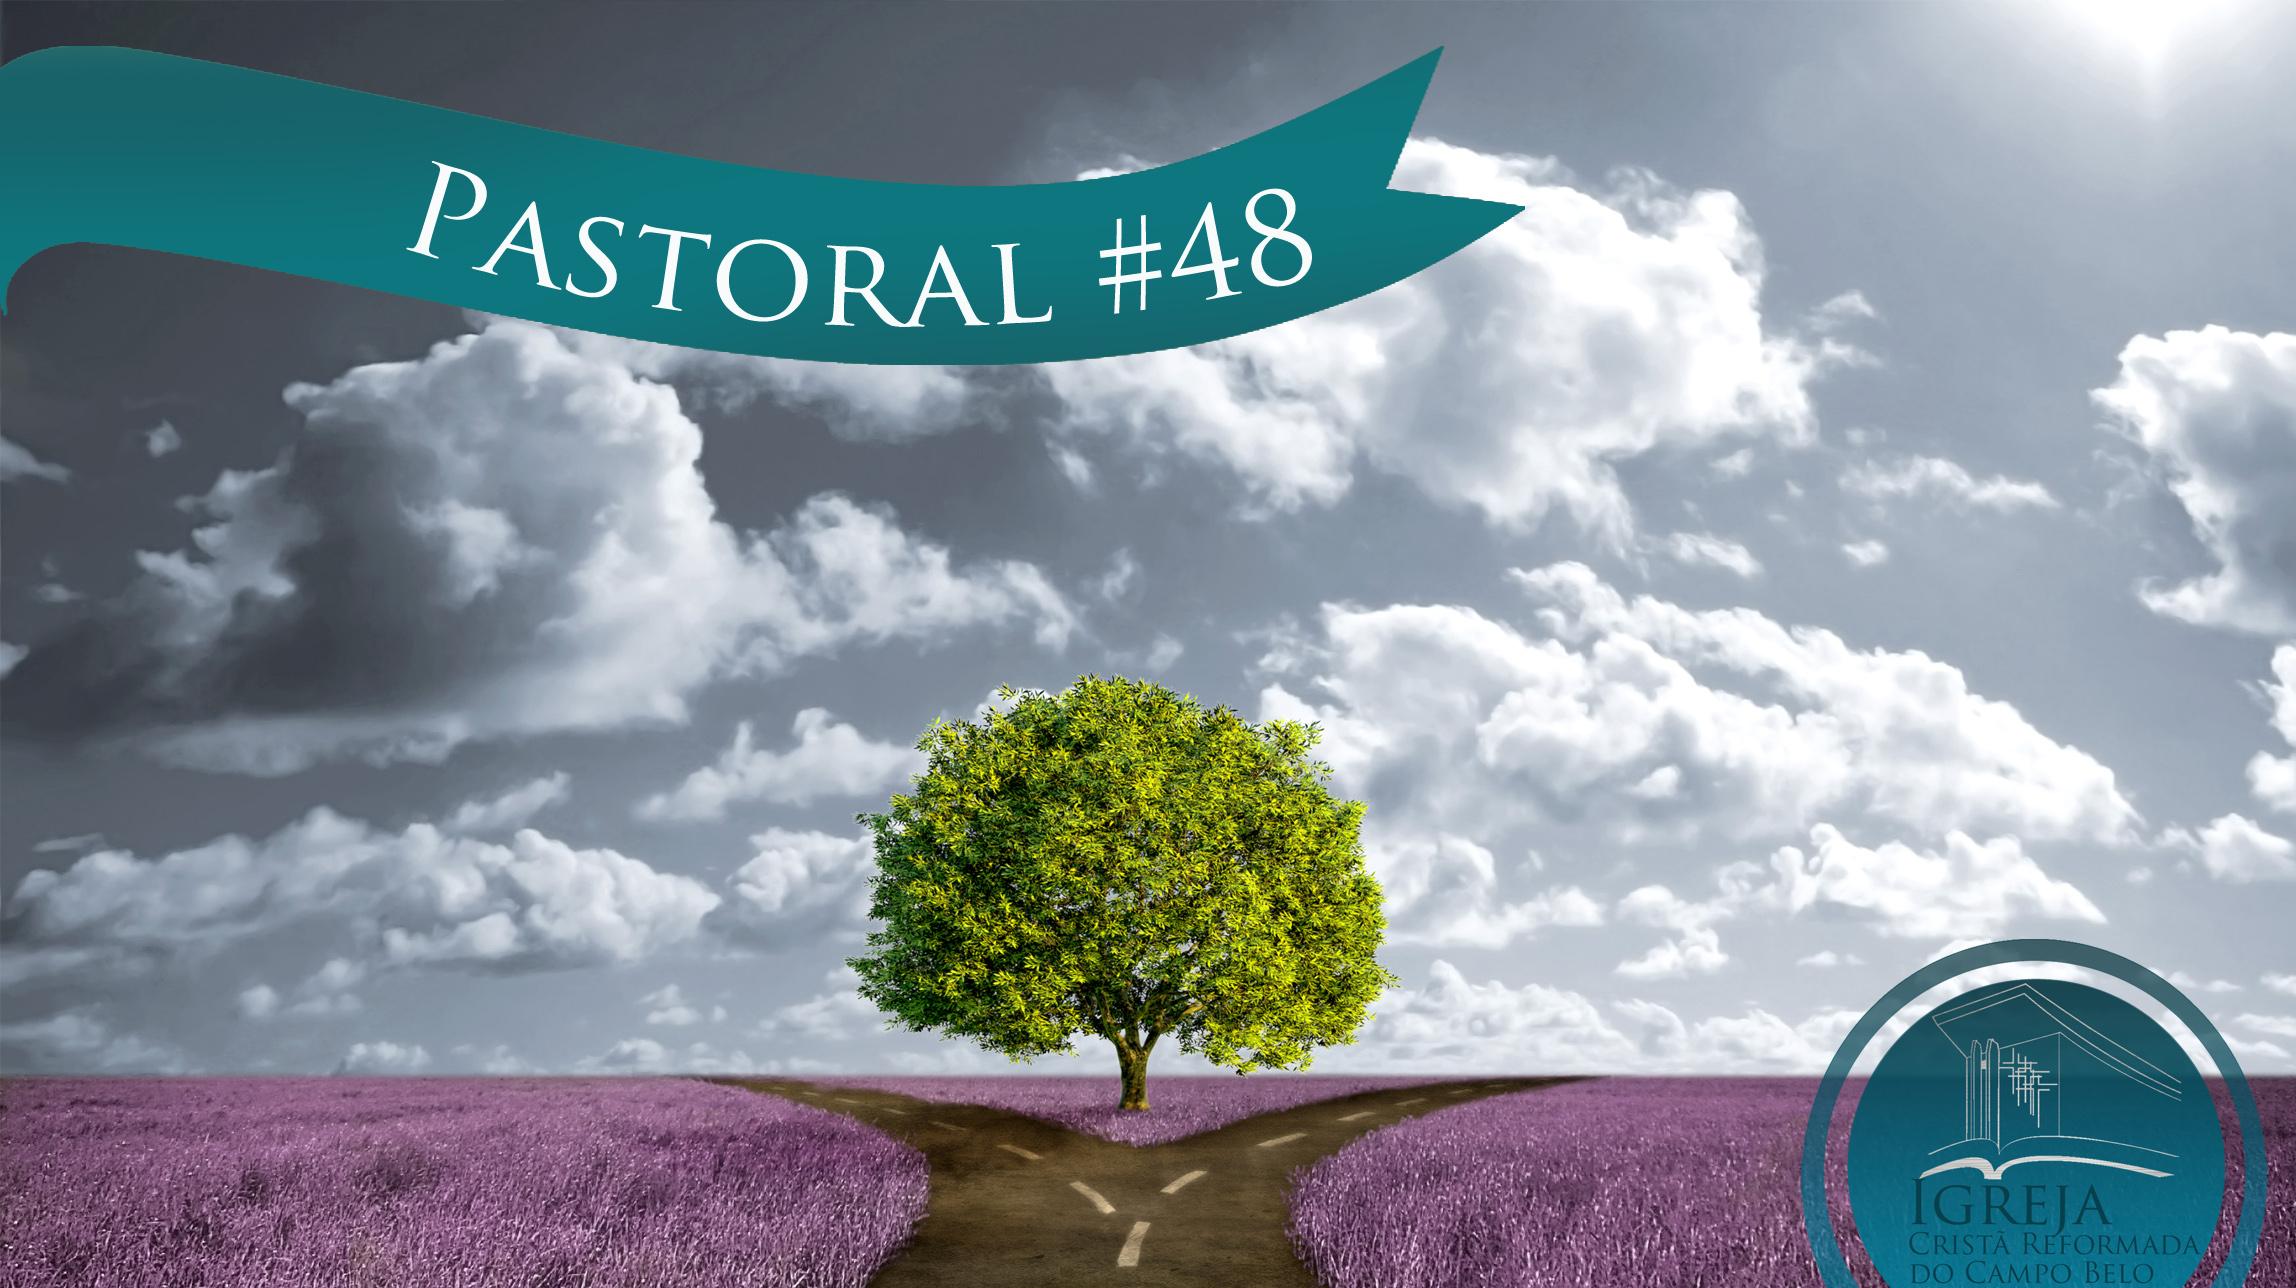 pastoral48